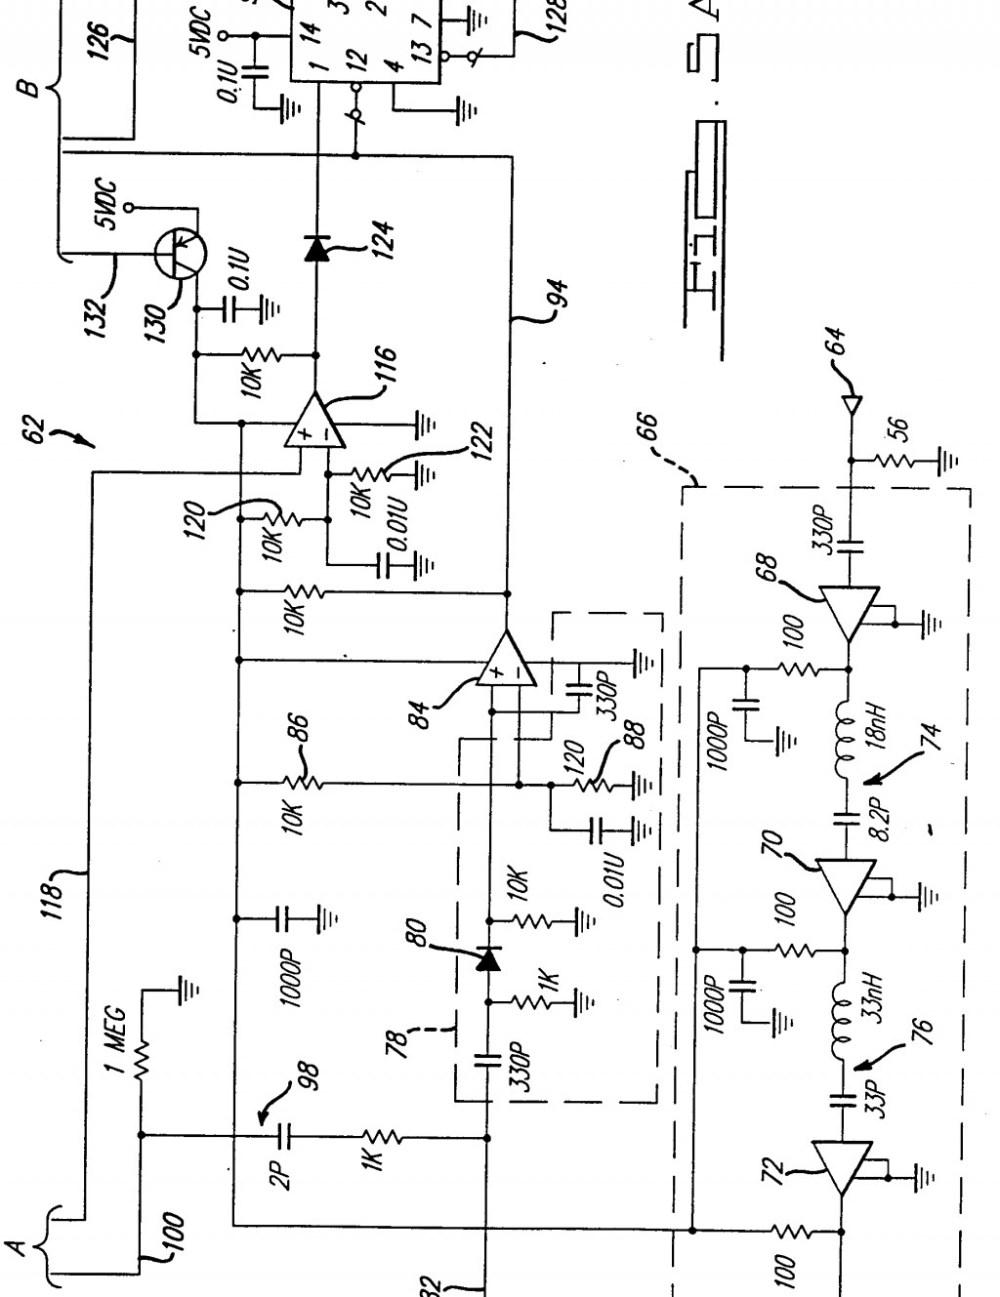 medium resolution of chamberlain garage door opener wiring diagram garage door opener wiring diagram futuristic chamberlain jesanet exceptional